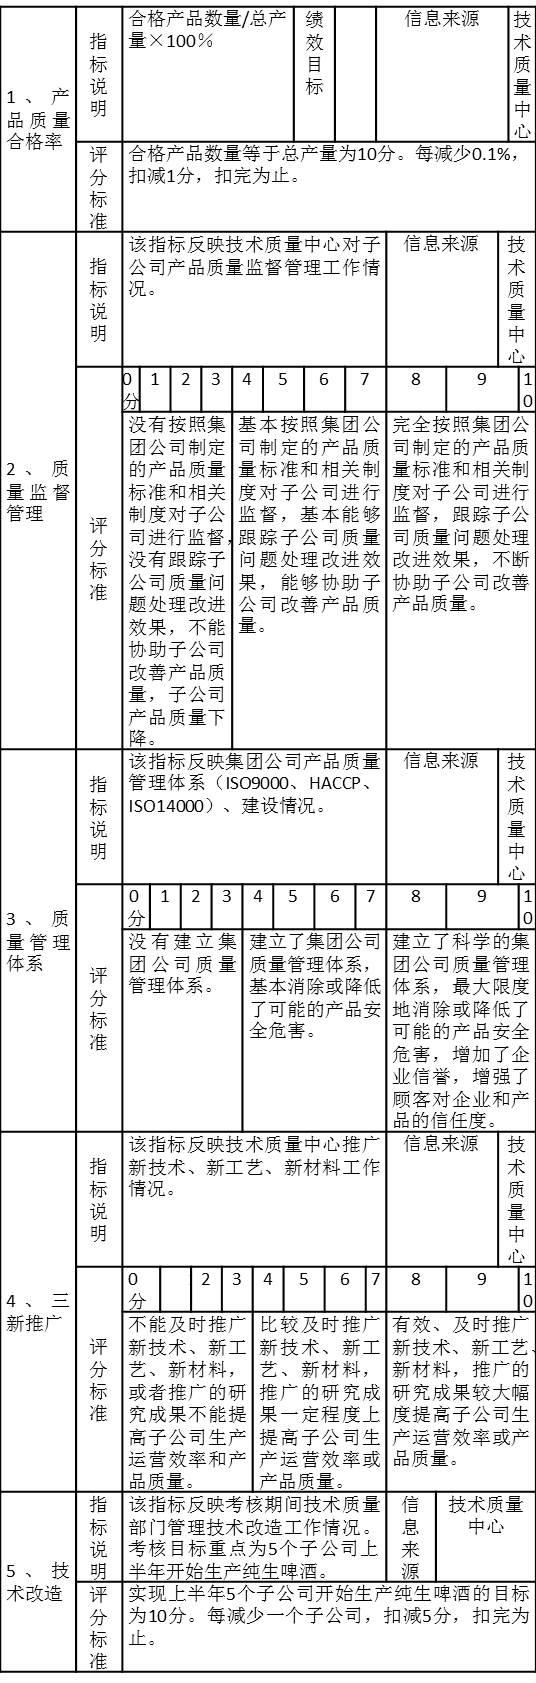 PJ技术质量中心(技术质量总监)年度目标责任考核注释表